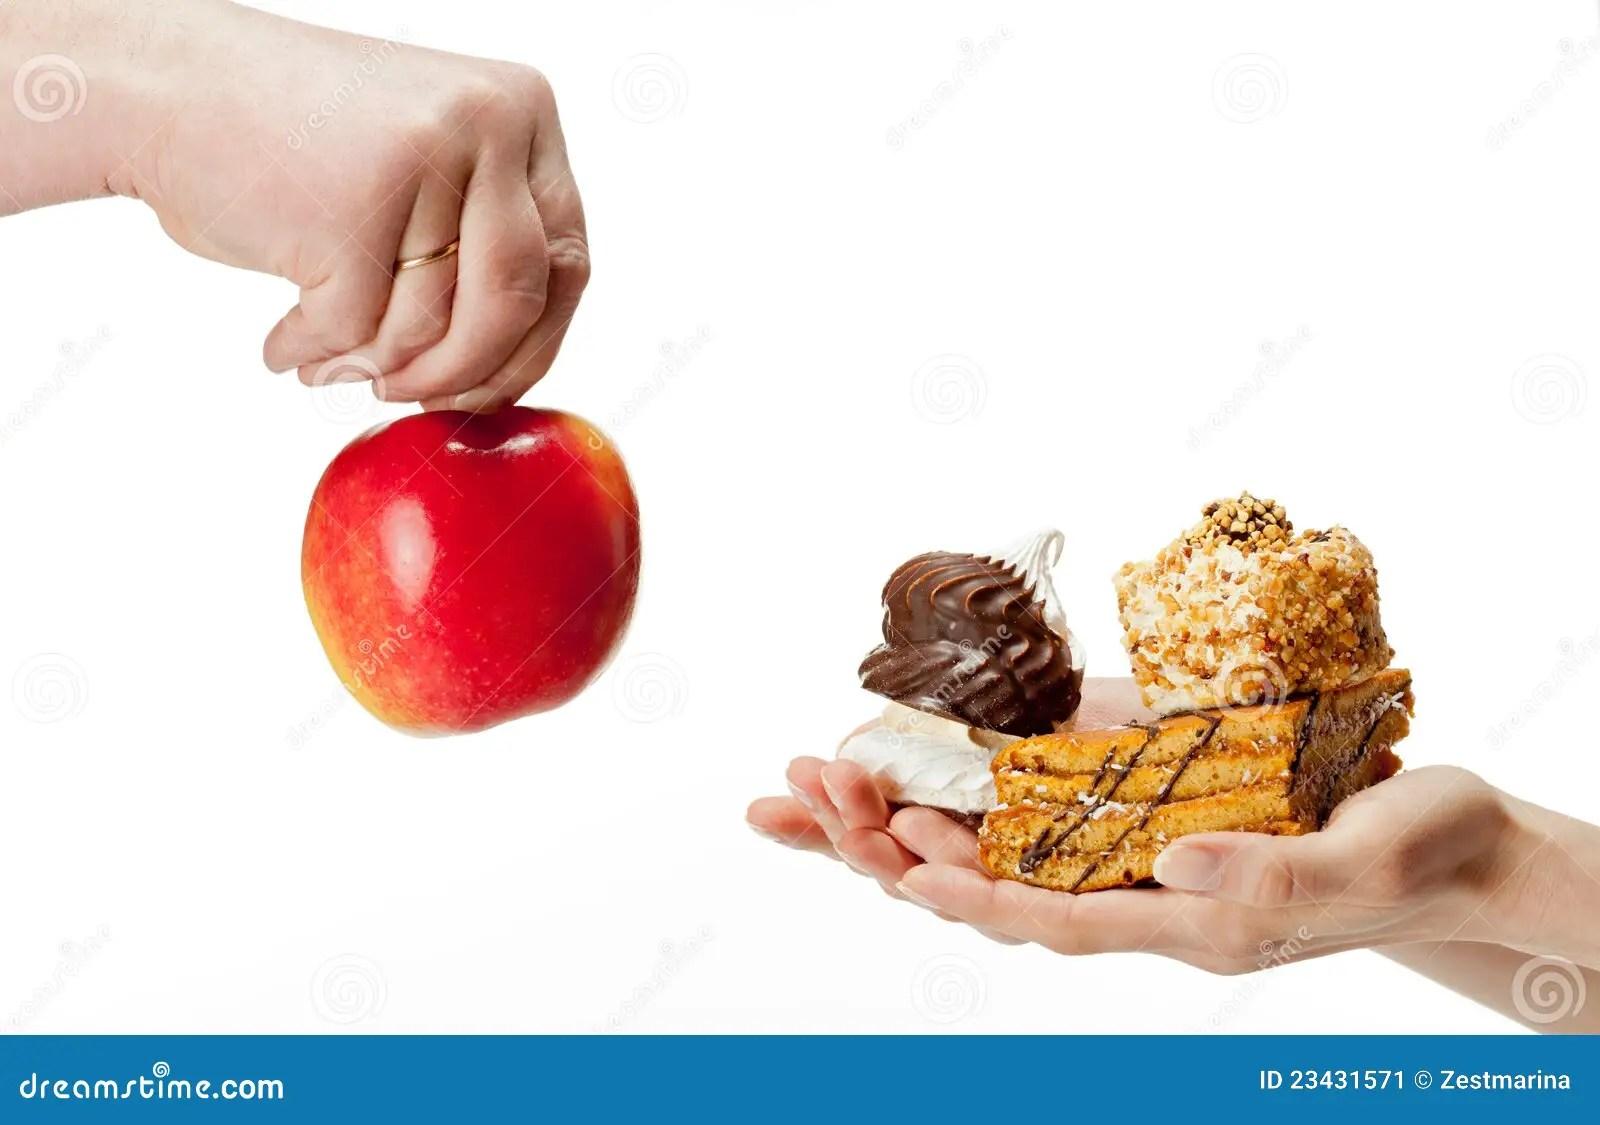 Healthy Food Healthy Unhealthy Food Pictures